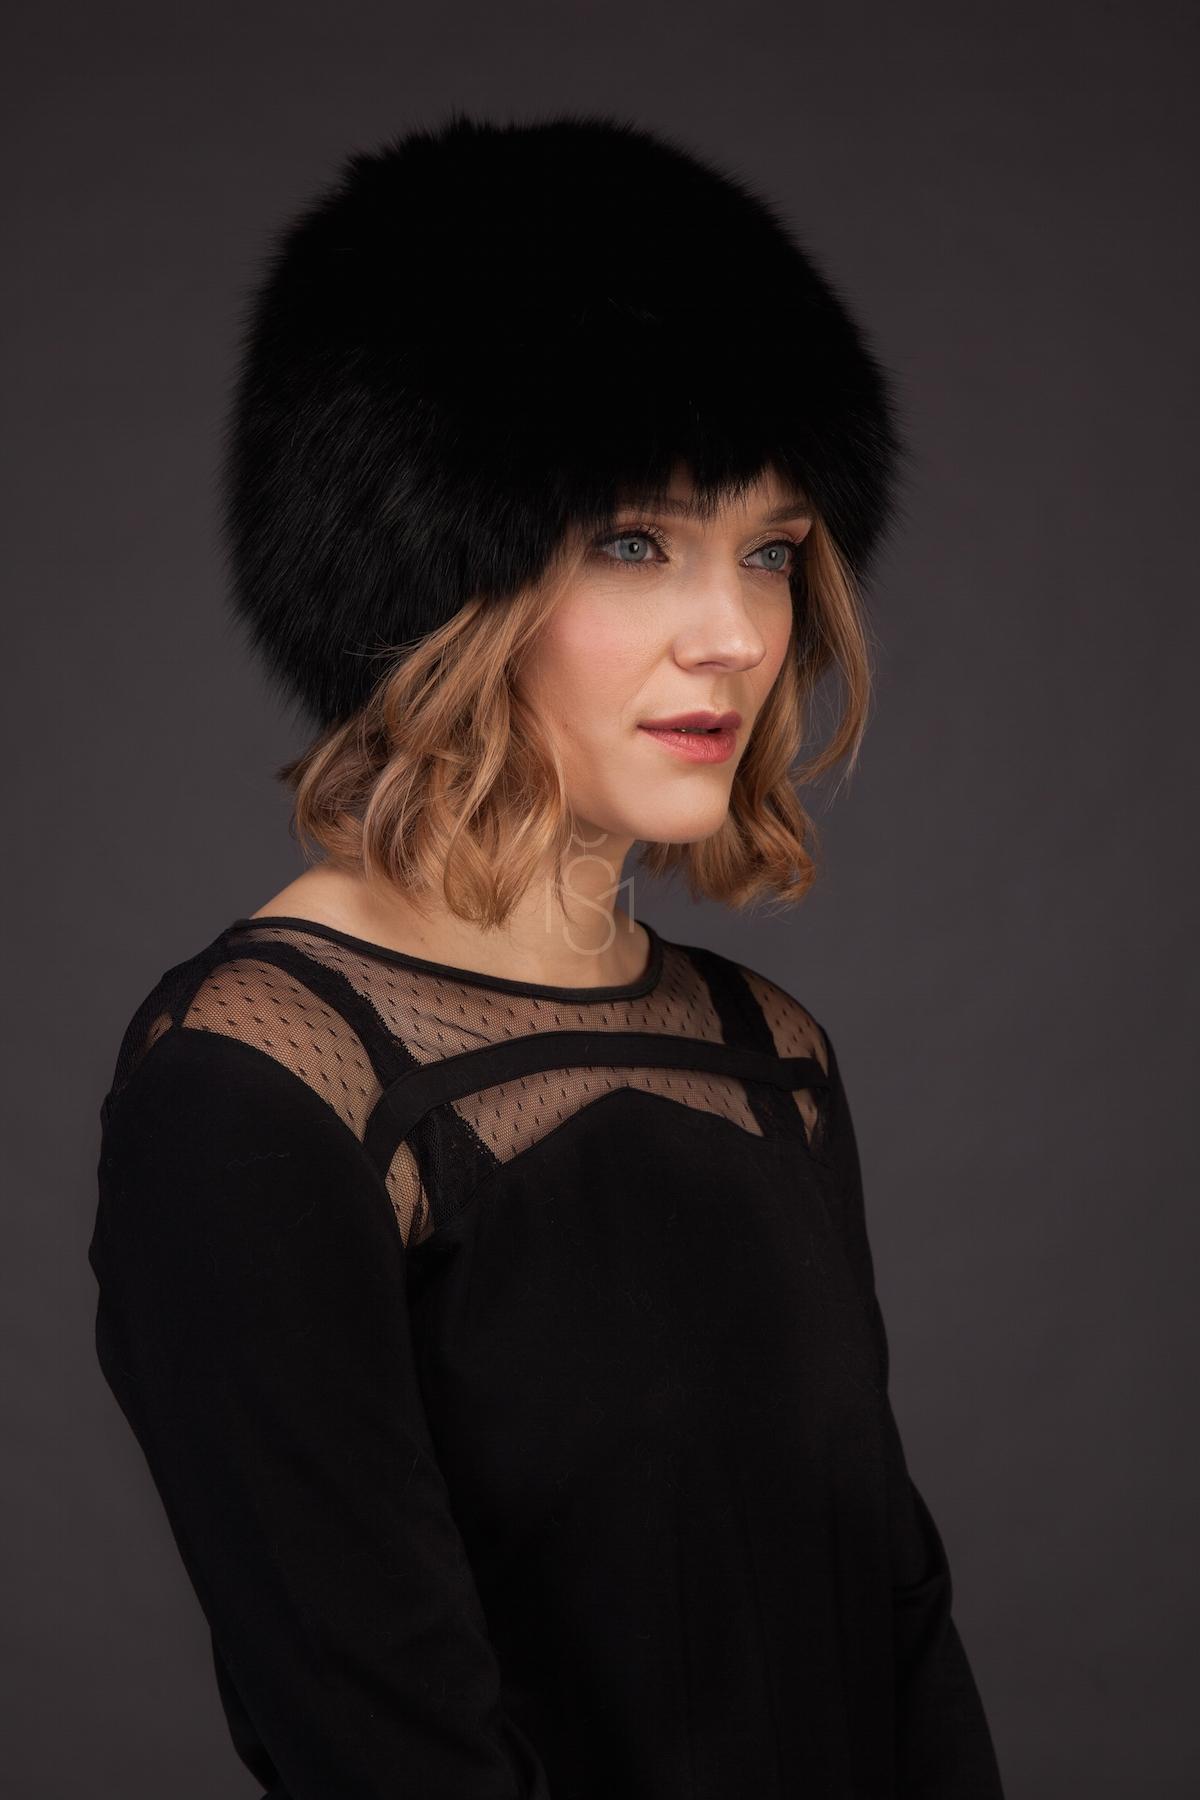 Knitted fox fur hat black made by SILTA MADA fur studio in Vilnius